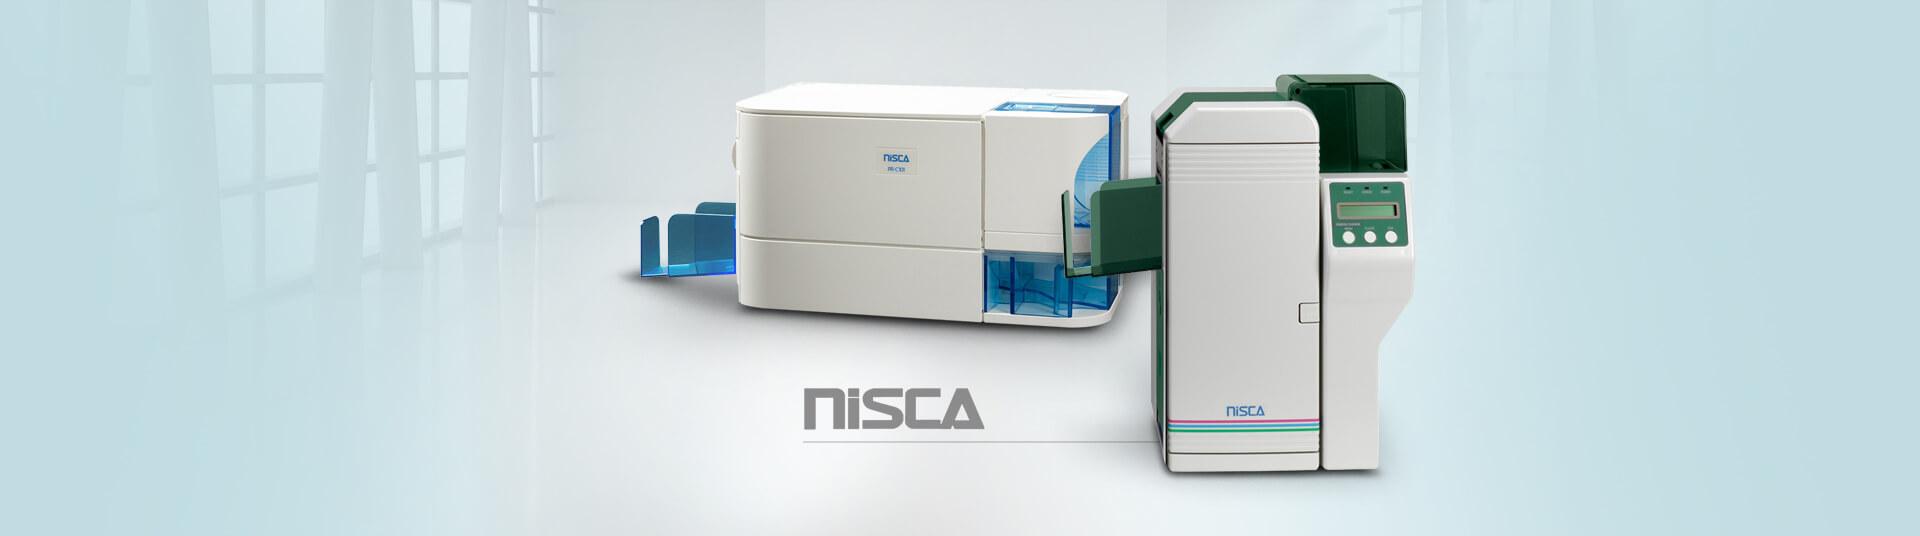 Nisca Photo ID Printers